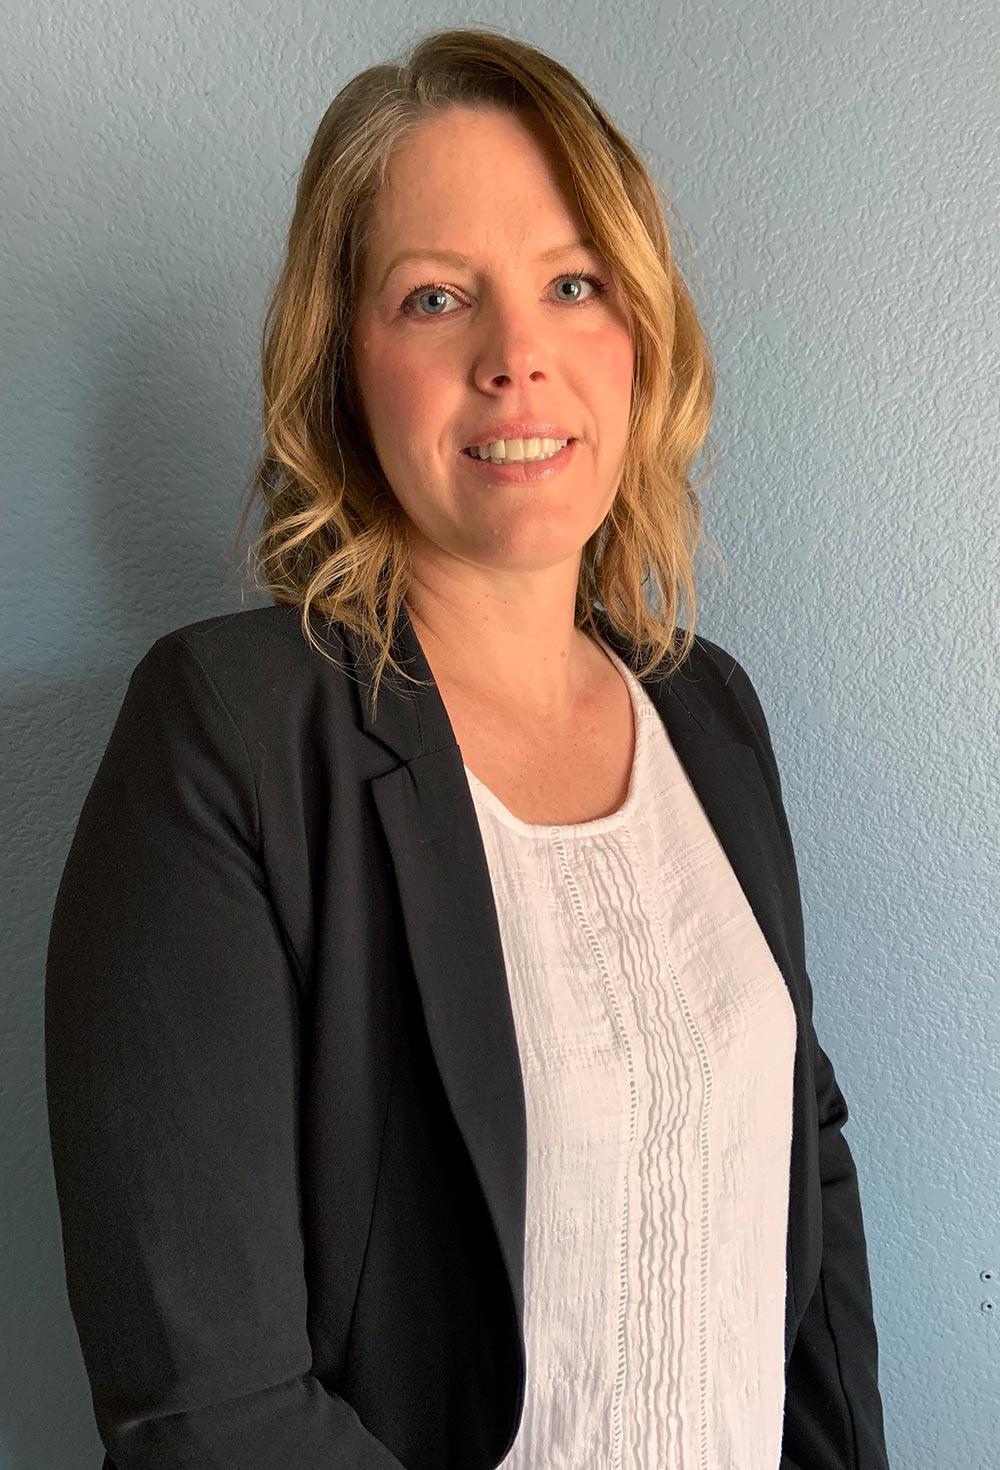 Jennifer LaFrance - Nurse Practitioner